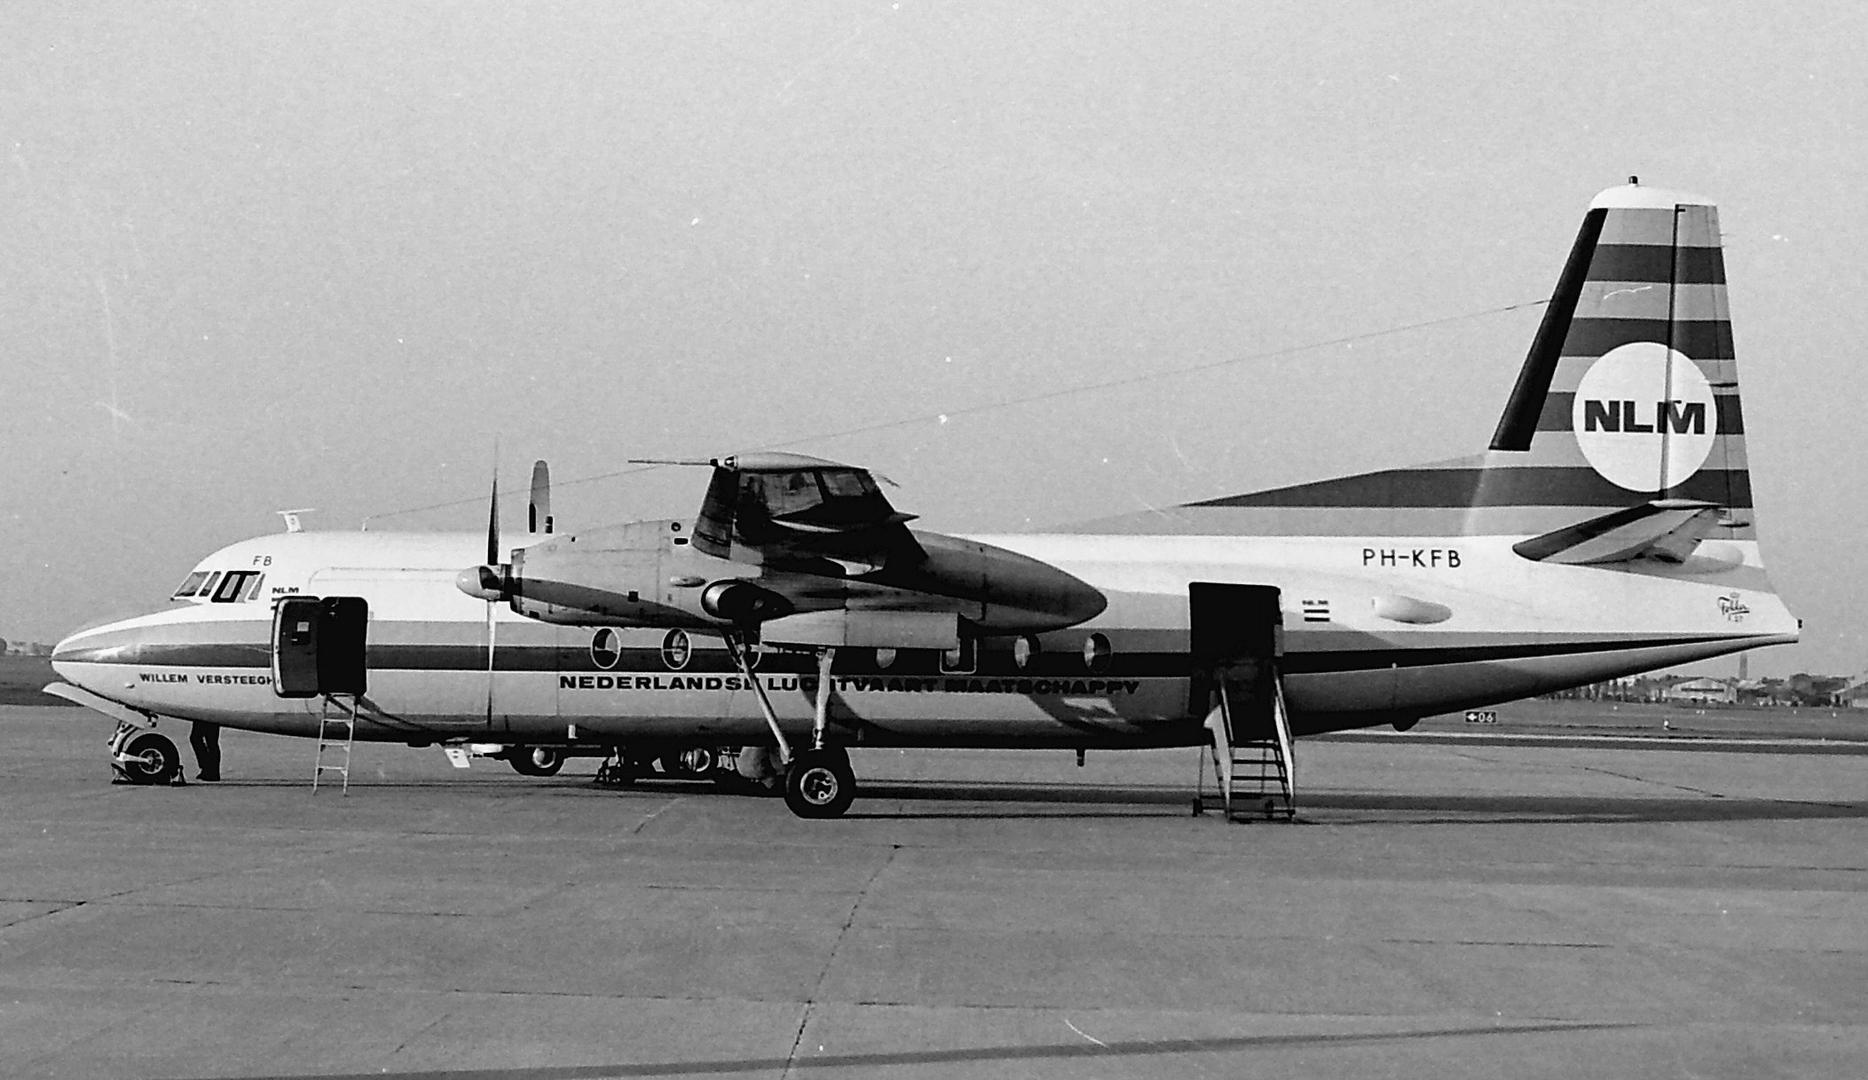 PH-KFB F-27 -300M Troopship NLM                                                                                                                                    (David Booster, Rotterdam, 1969)